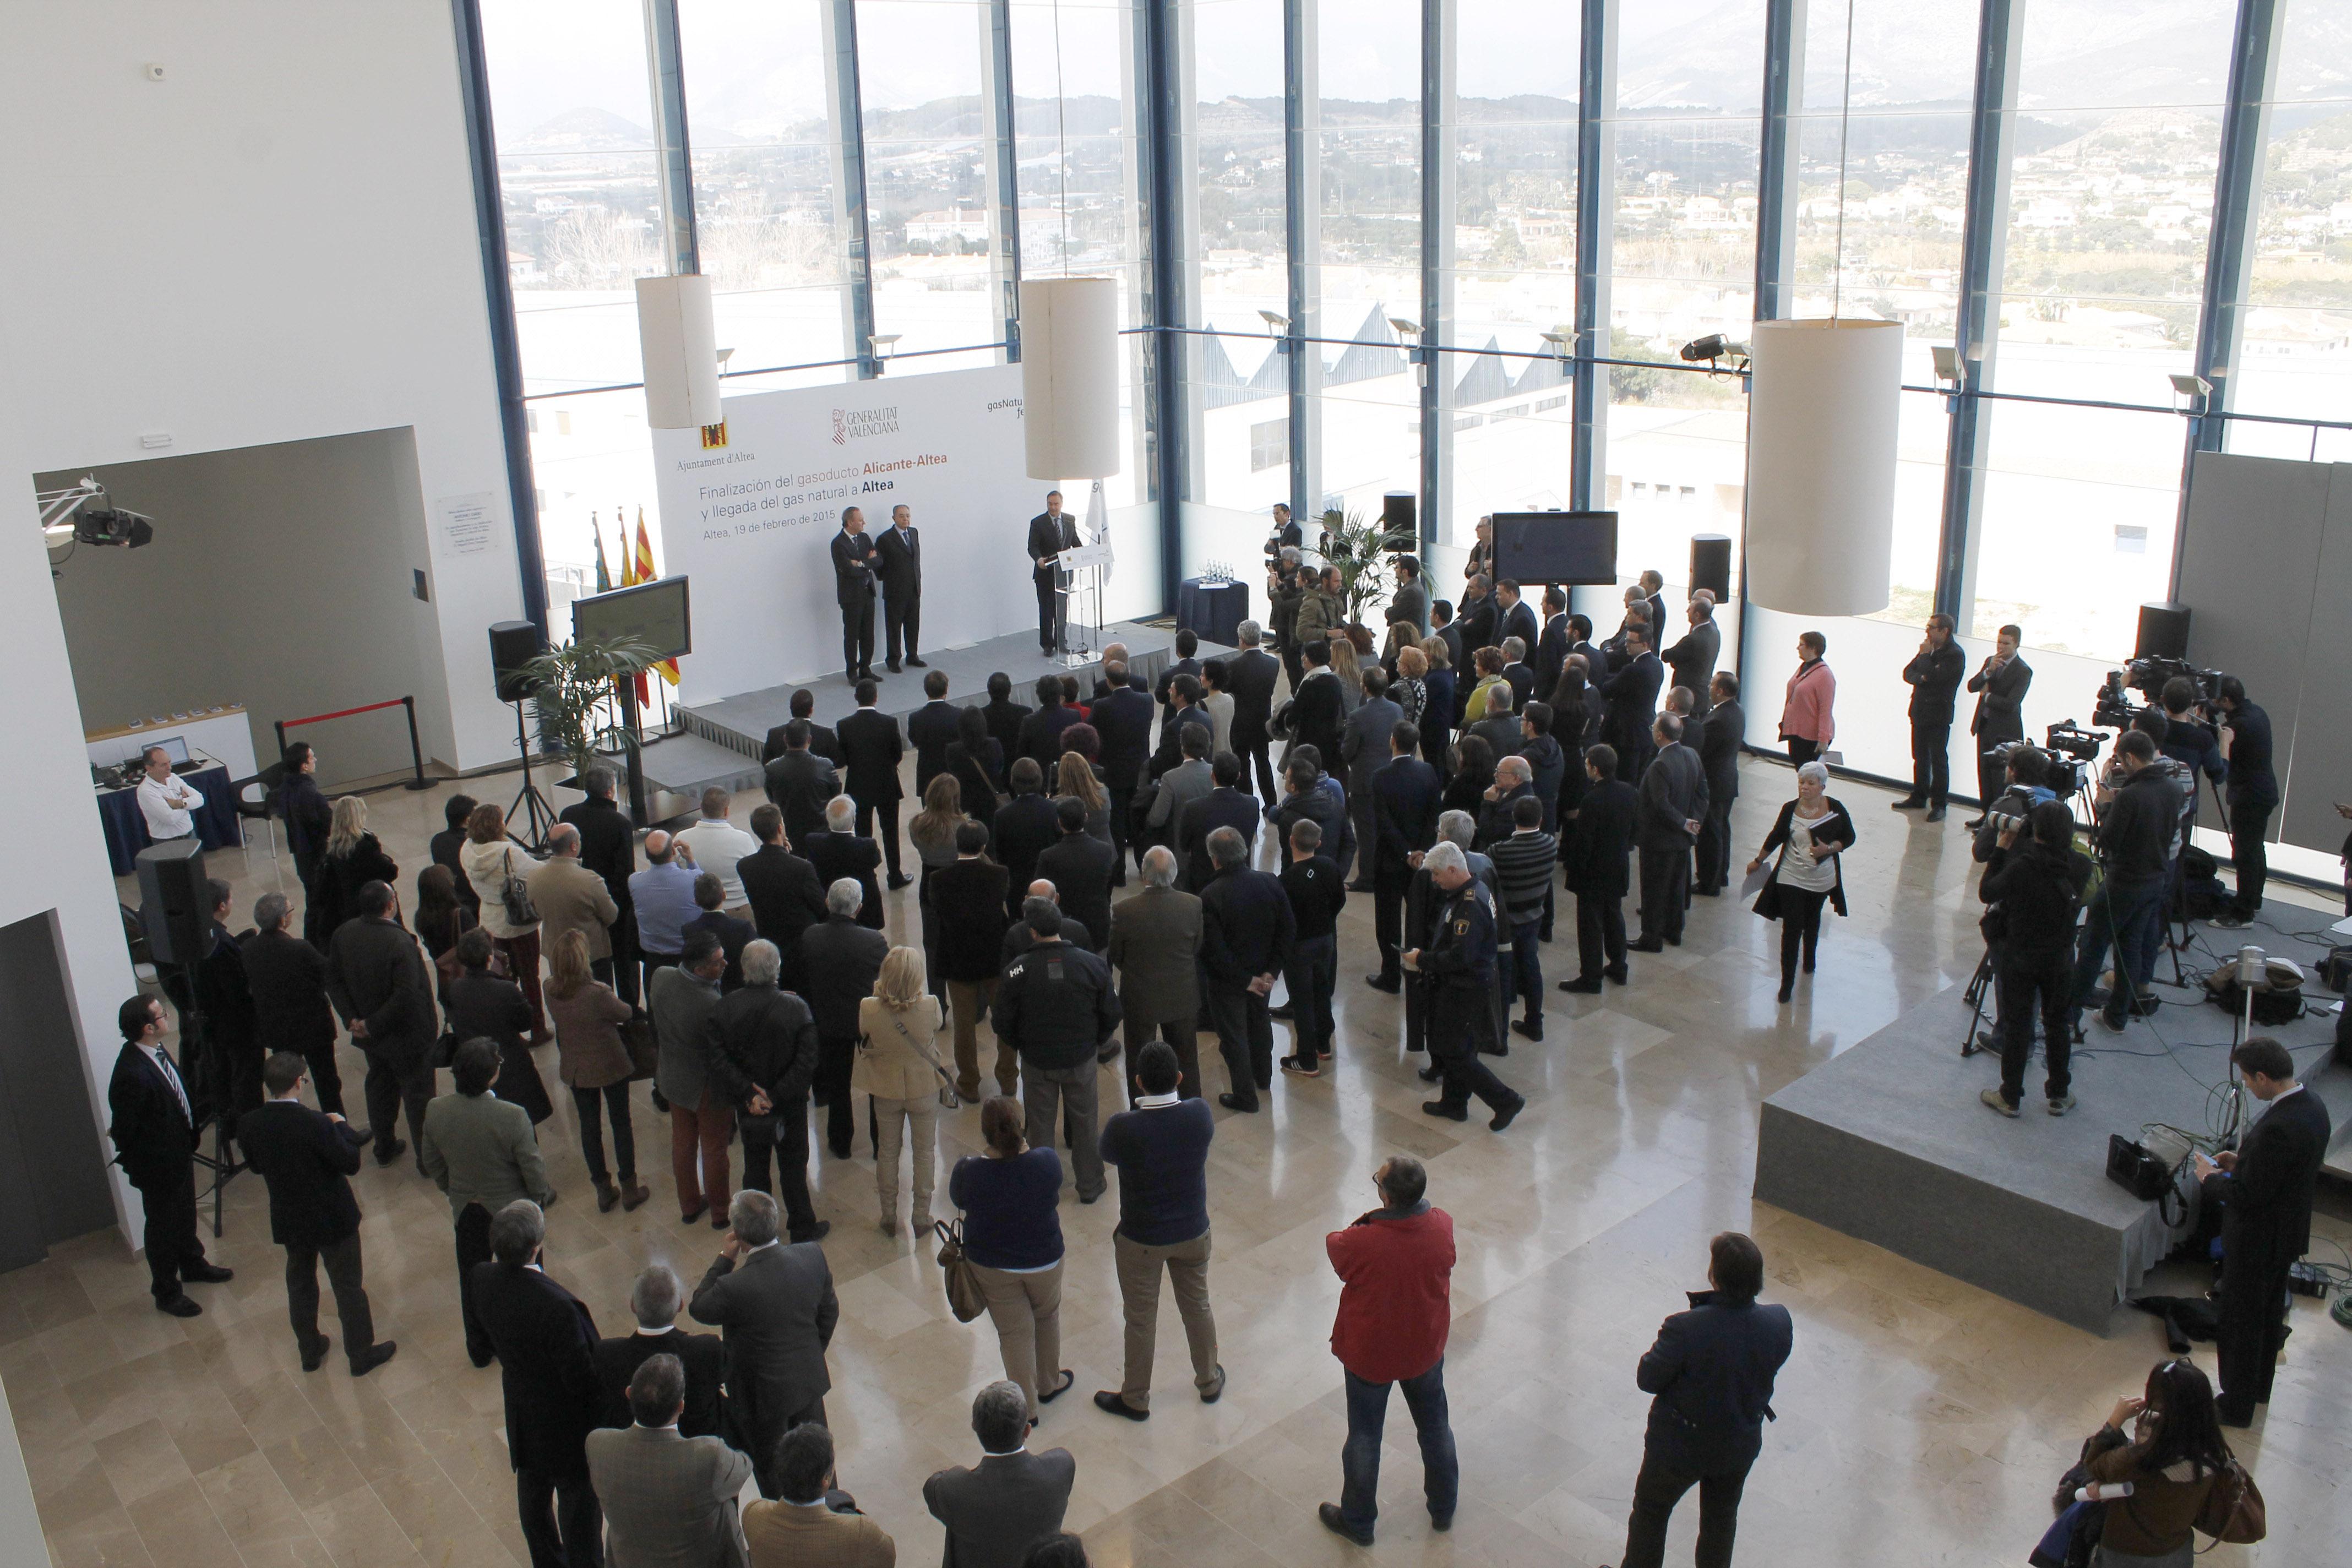 Montaje integral de evento - Palacio de Cogresos de Altea (AGENCIA PORTER NOVELLI)